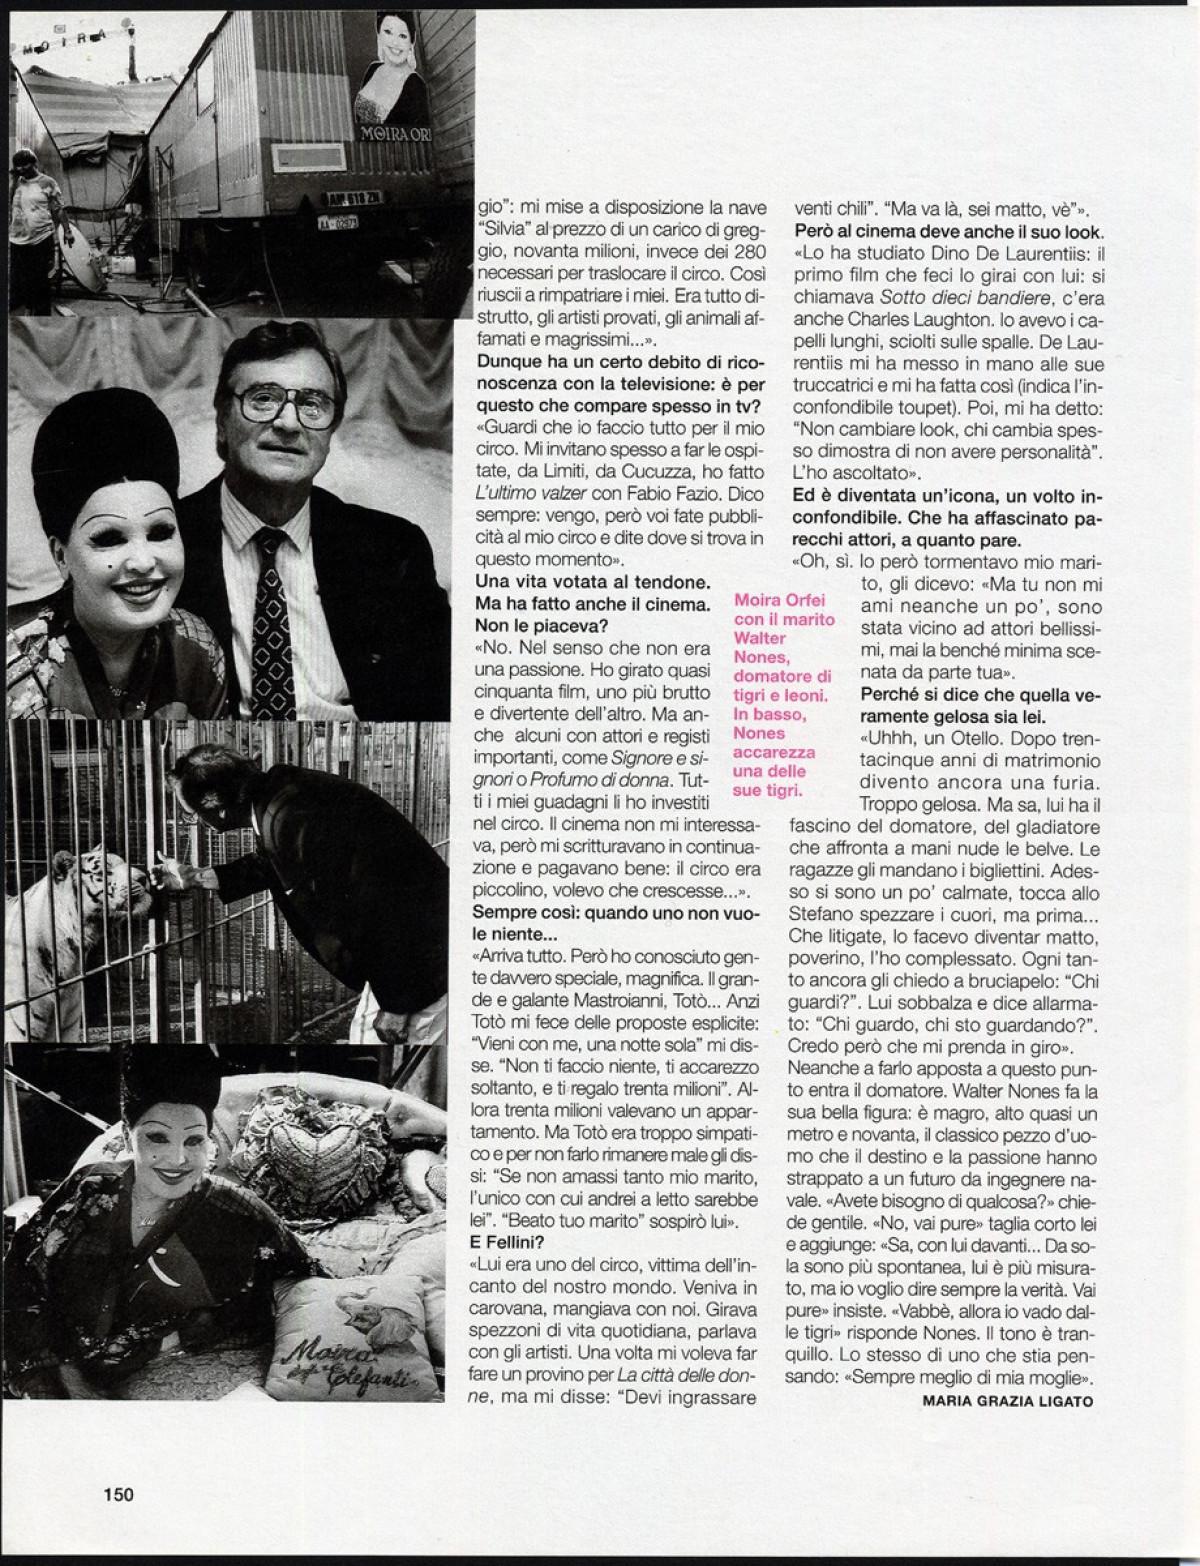 2002 - Moira Orfei - Io donna